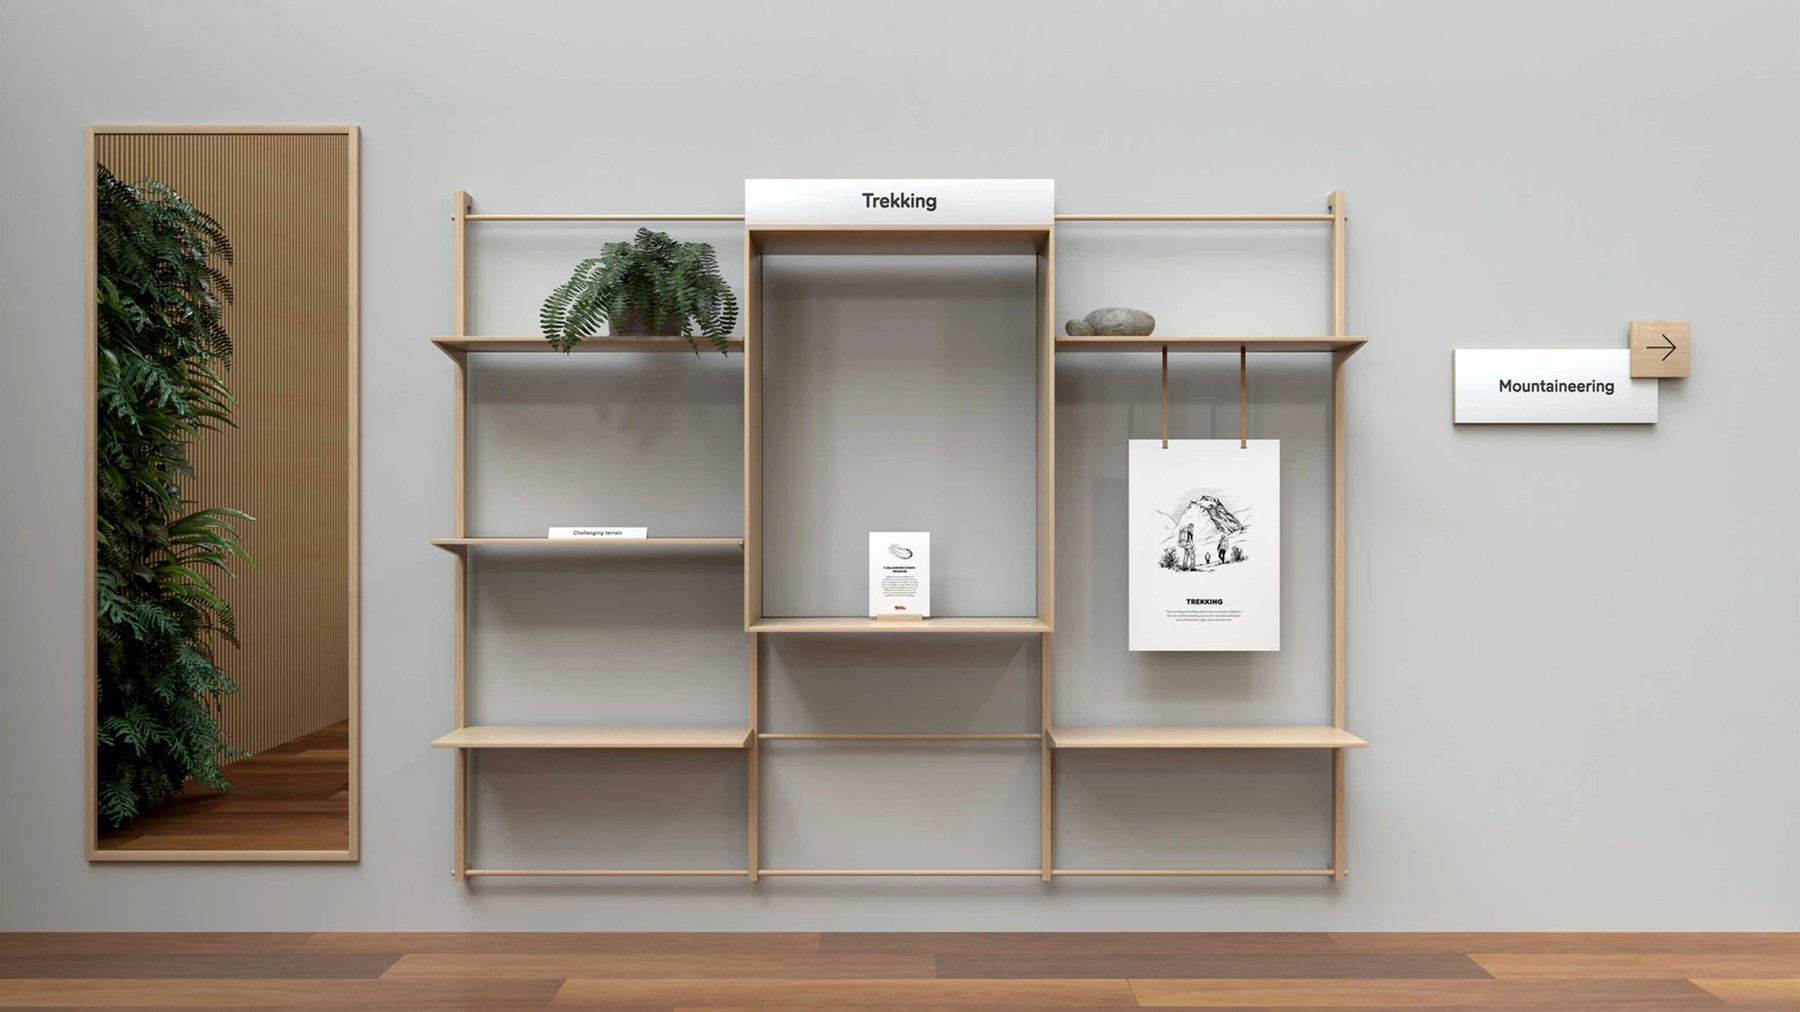 fjallraven_retail-shelf-system_1560x877px@2x.webp